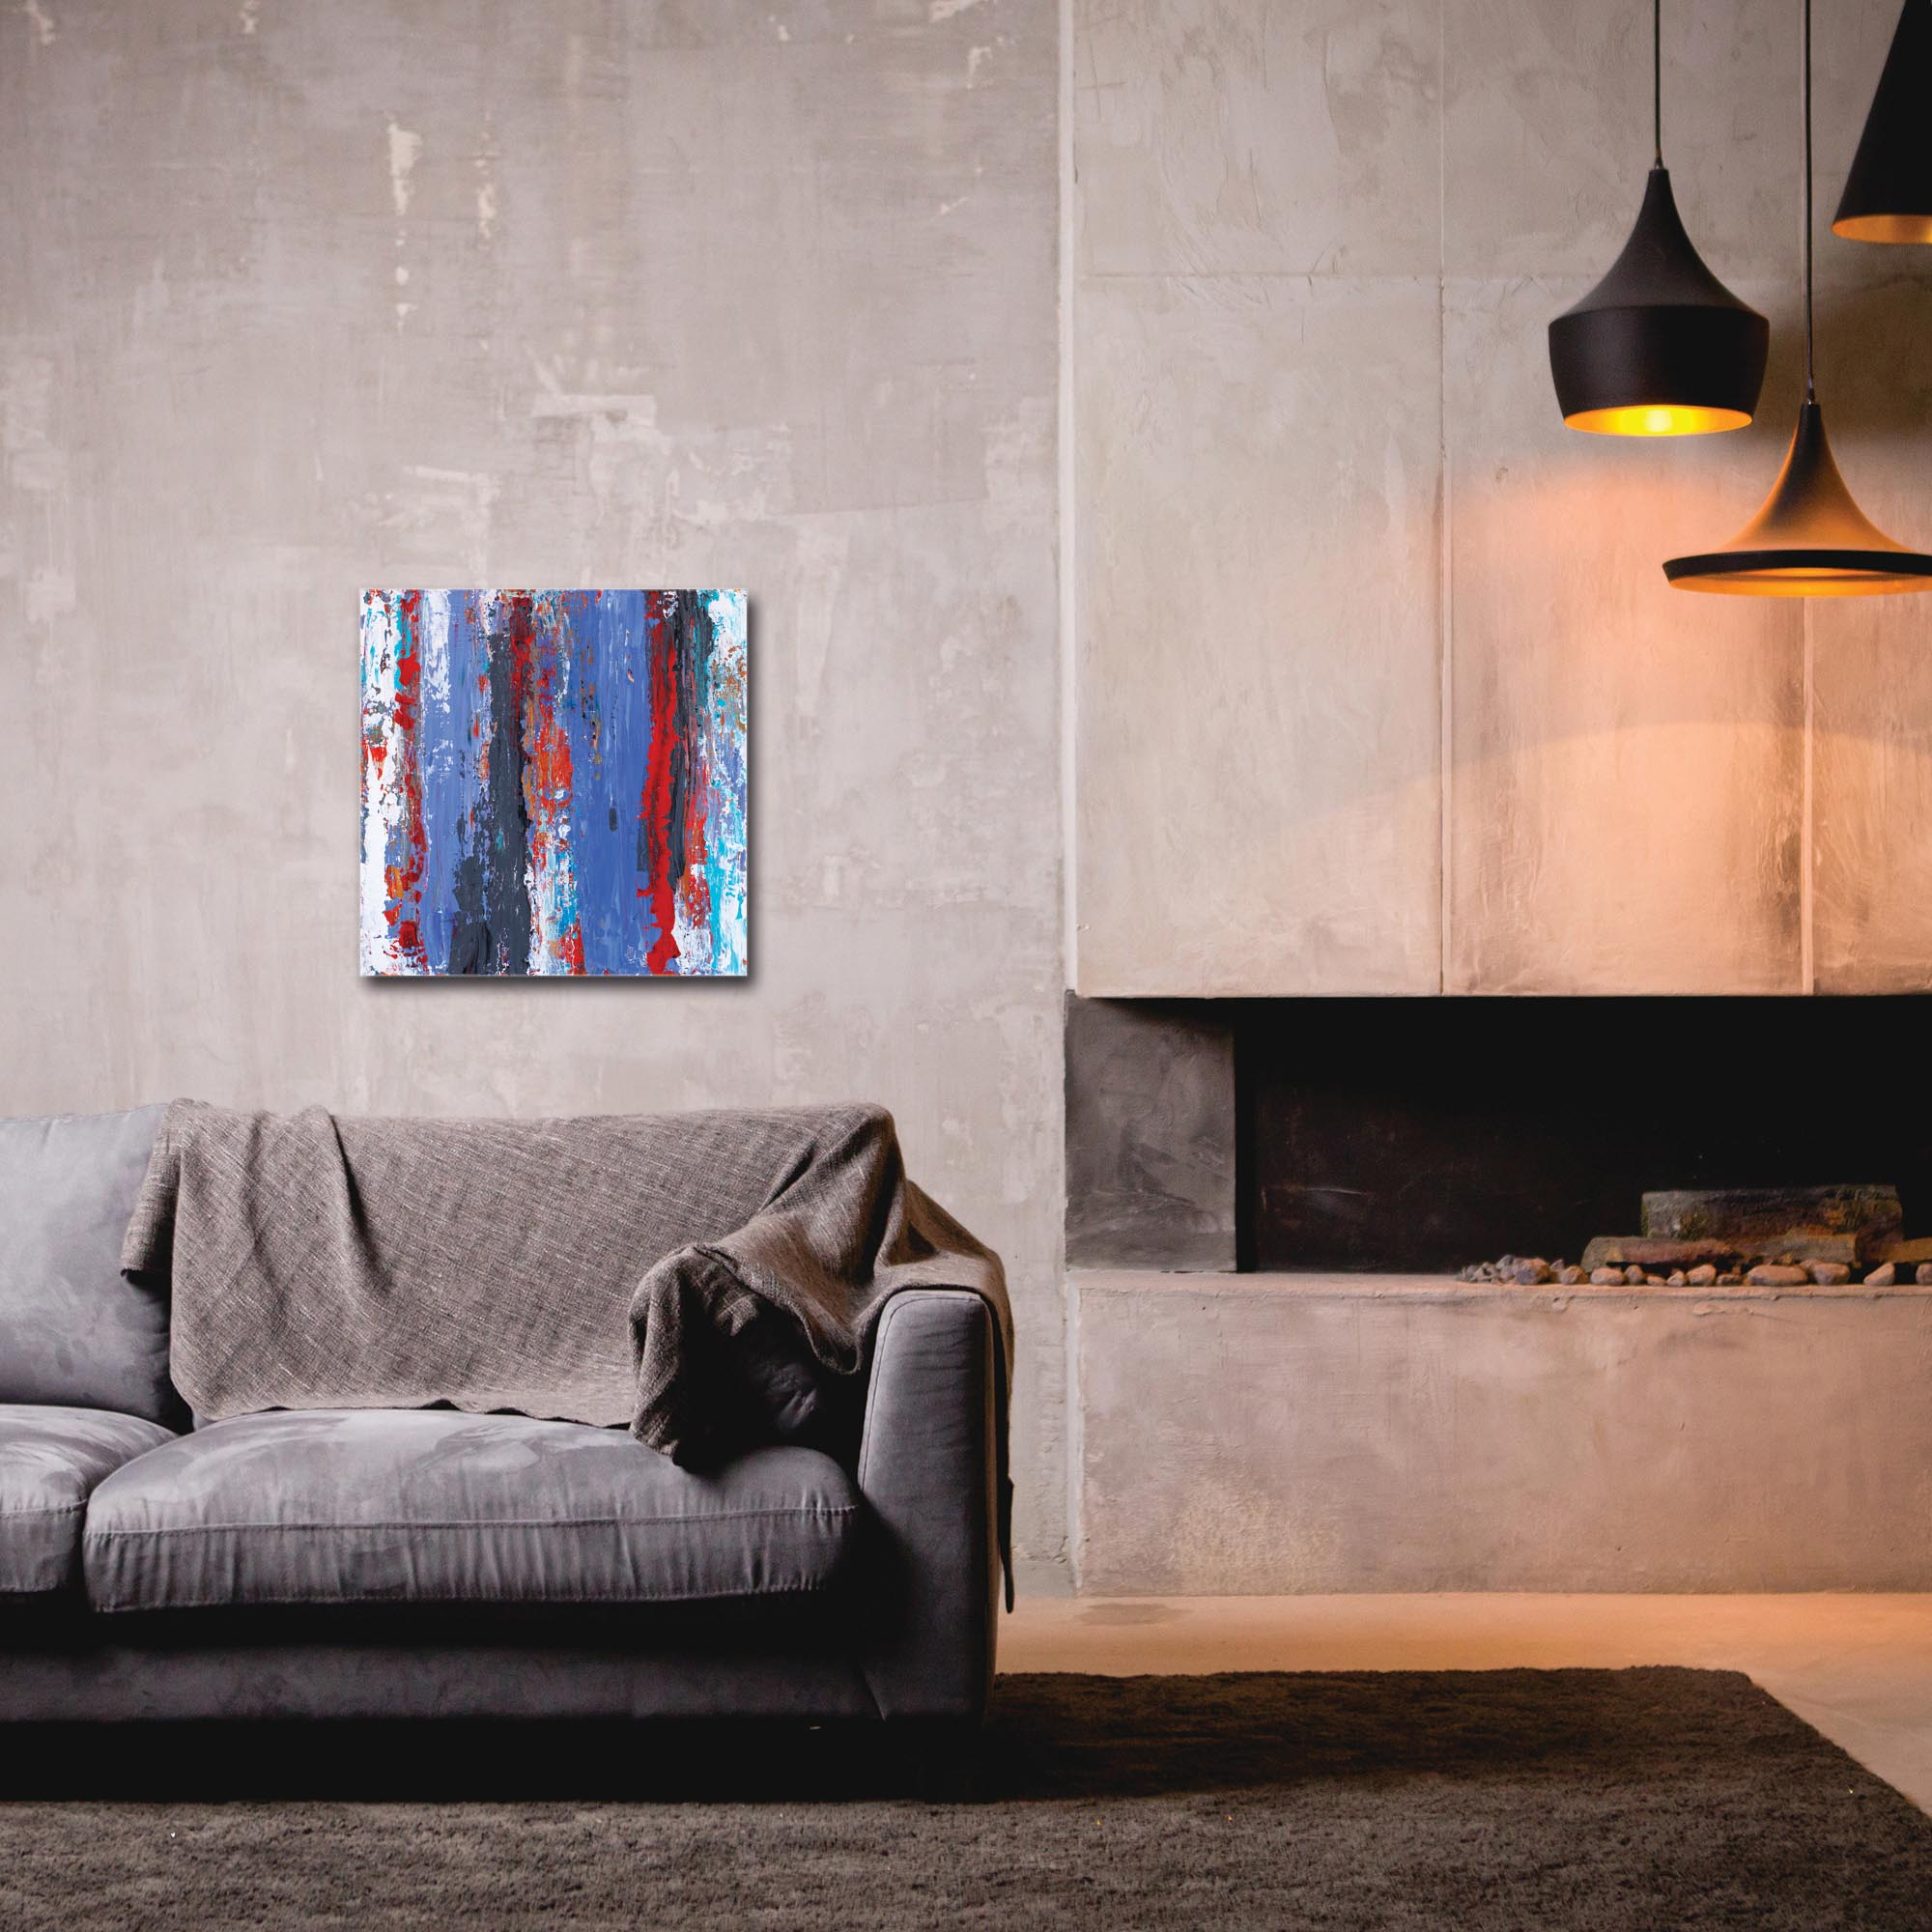 Abstract Wall Art 'Urban Life 15' - Urban Decor on Metal or Plexiglass - Image 3